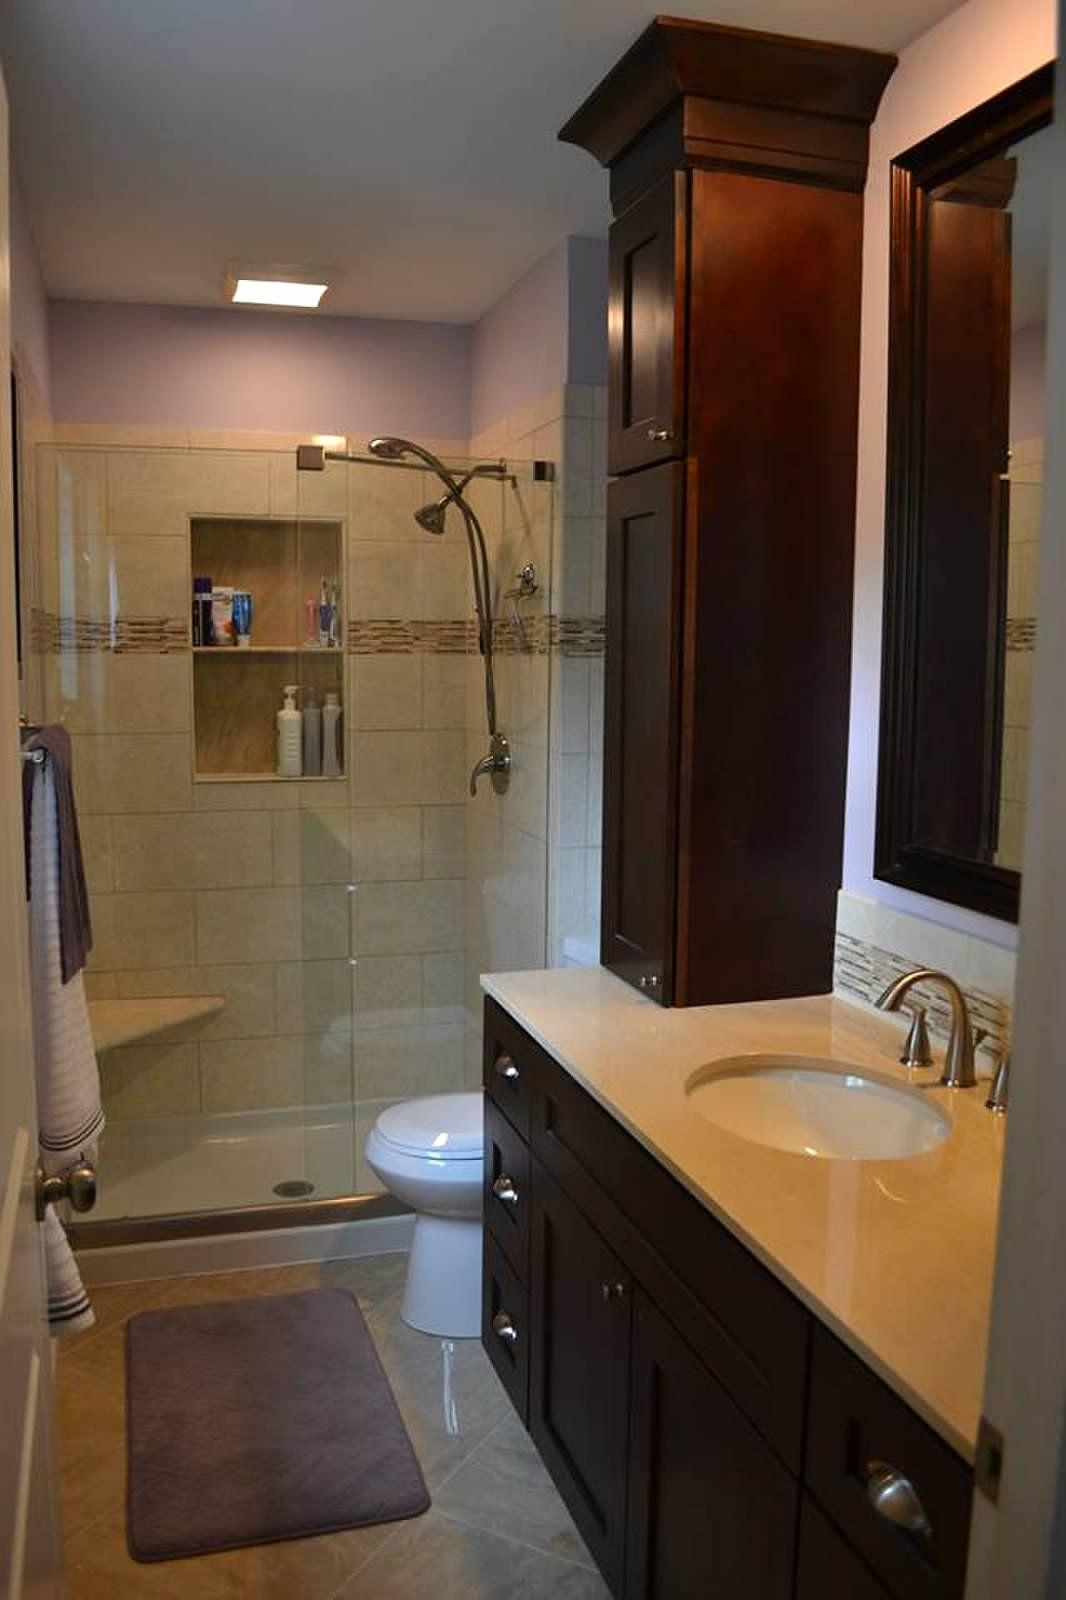 Master Bathroom Renovation: Small Master Bathroom Remodel